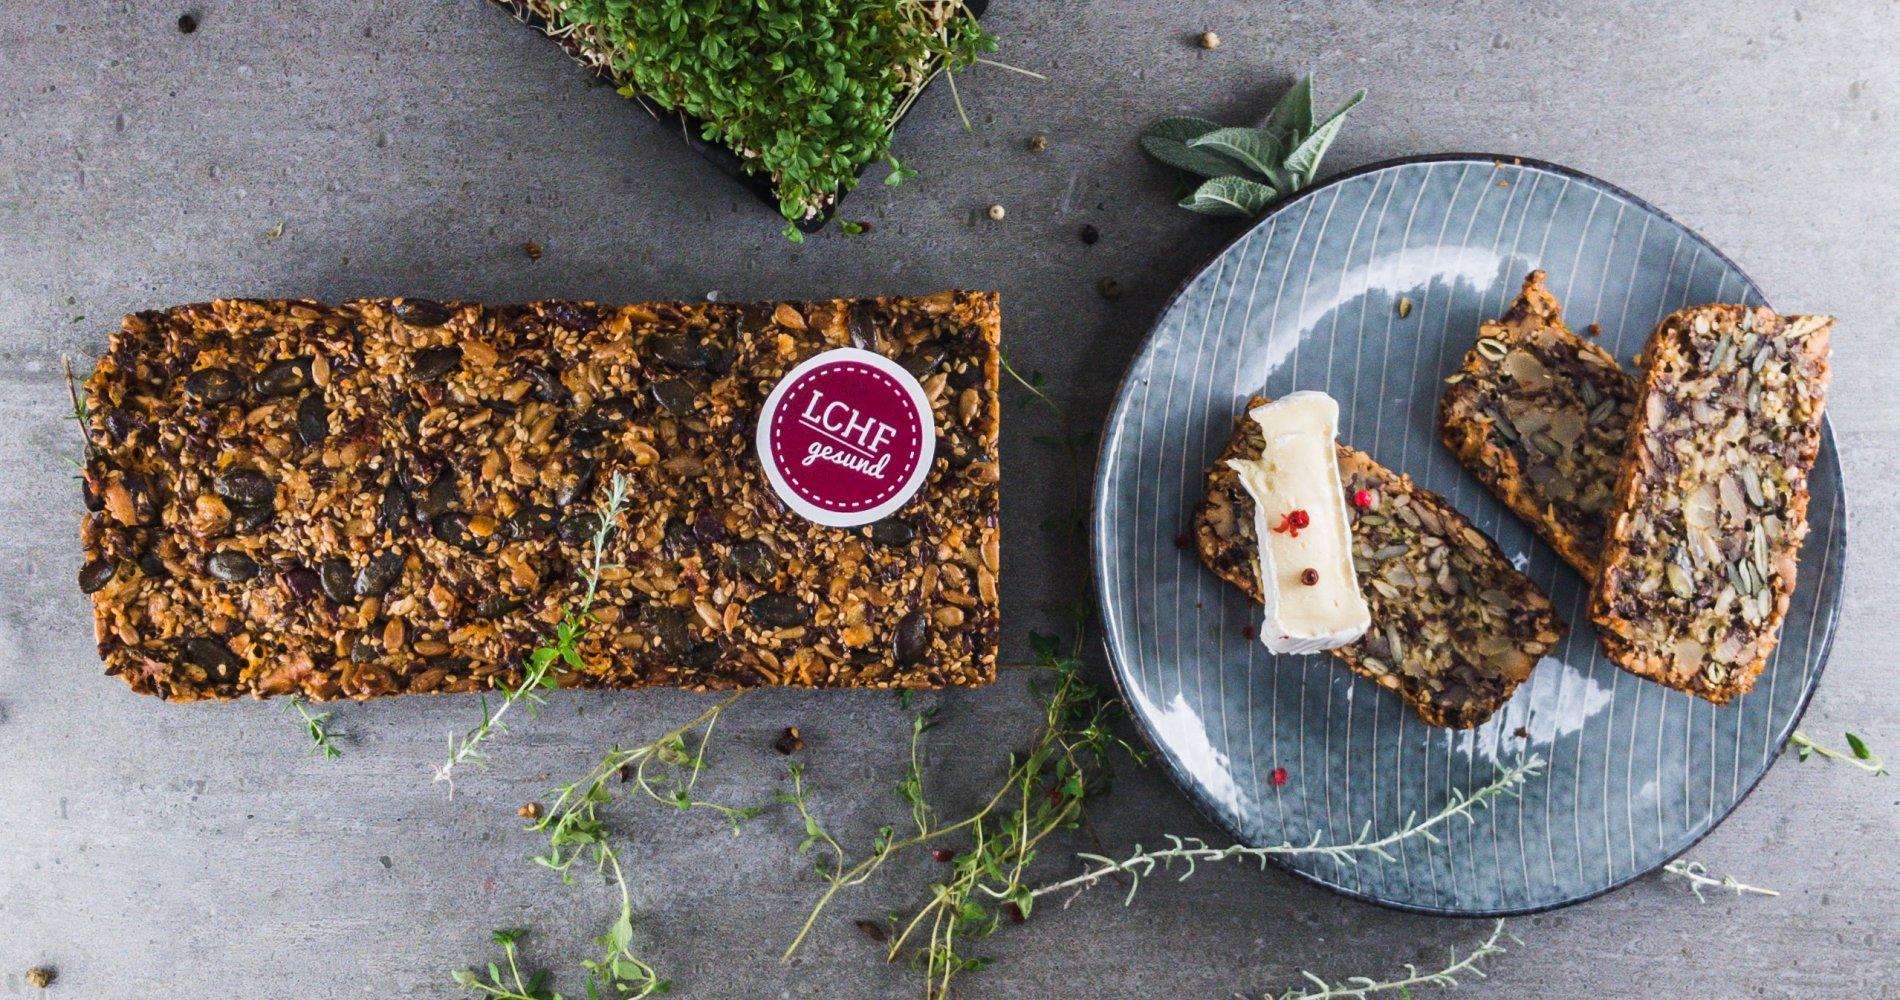 Rezept Low Carb: Käse-Nussbrot - LCHF-gesund.de